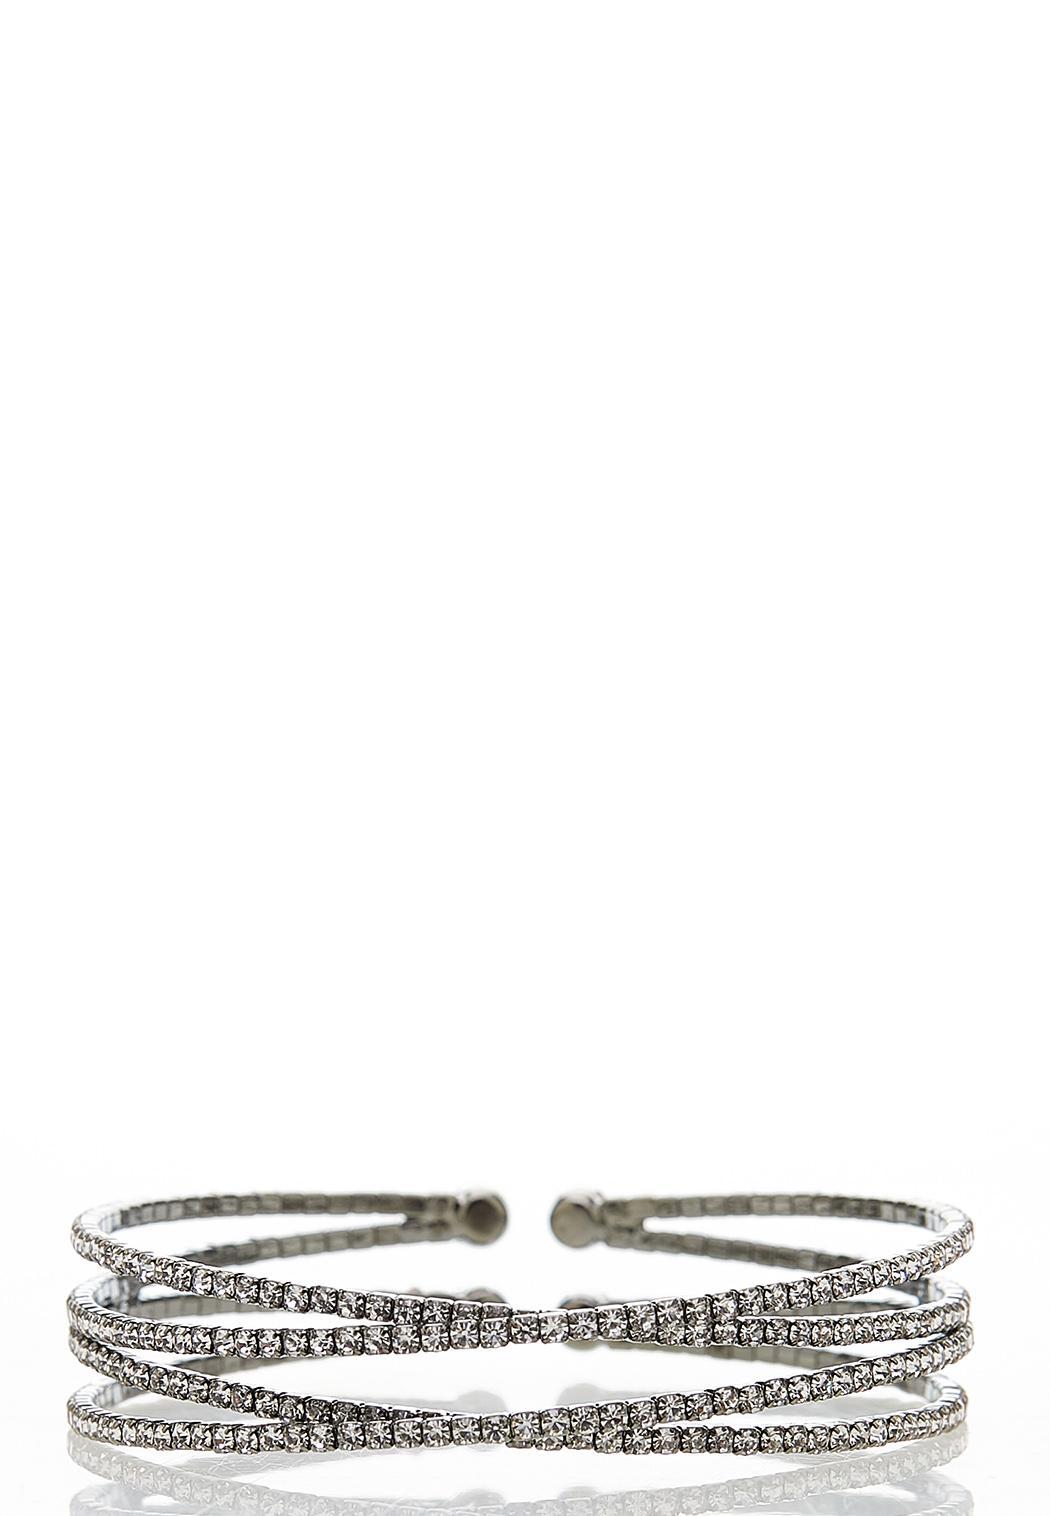 Criss Cross Rhinestone Cuff Bracelet